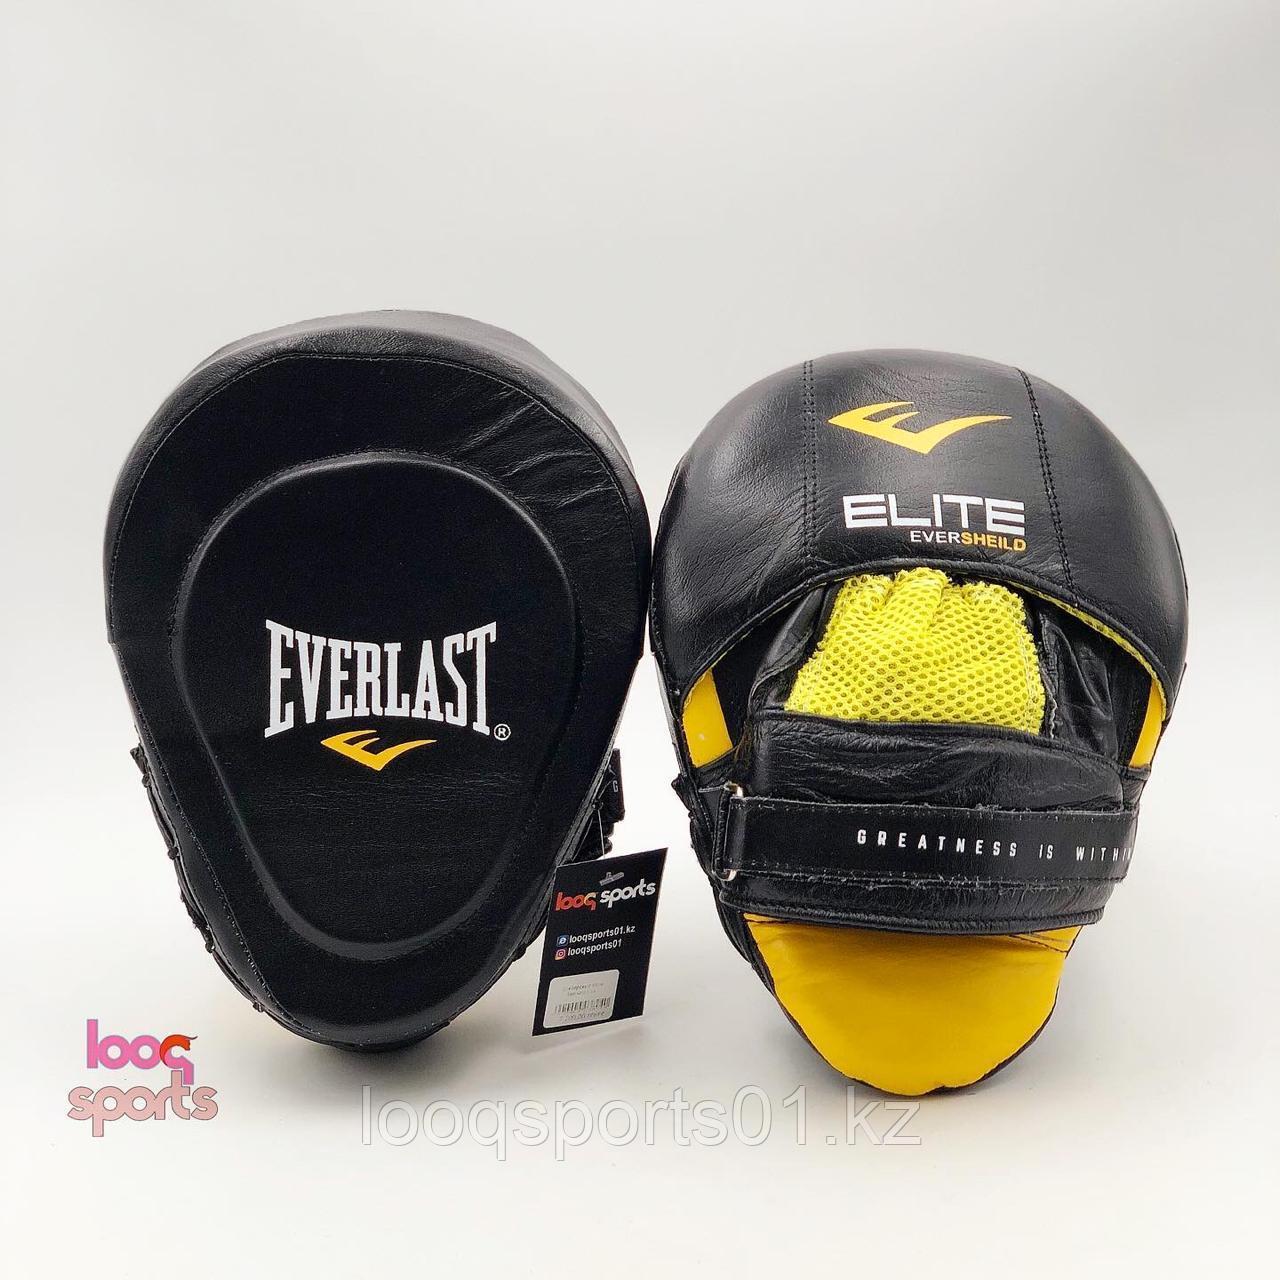 Боксерские лапы (кожа) Everlast